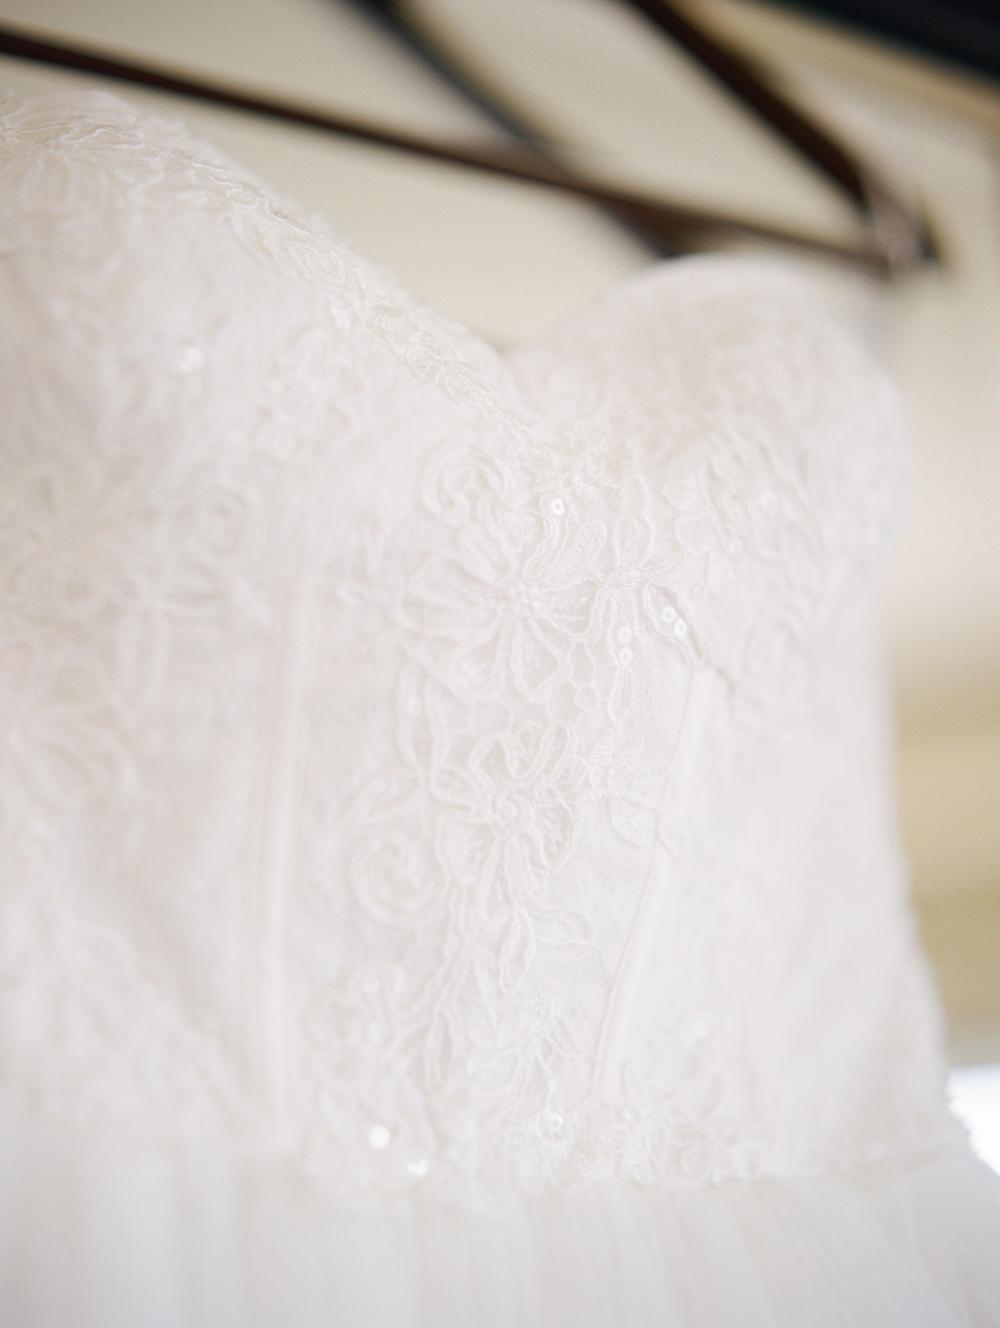 grandrapids-michigan-wedding-photographer-5